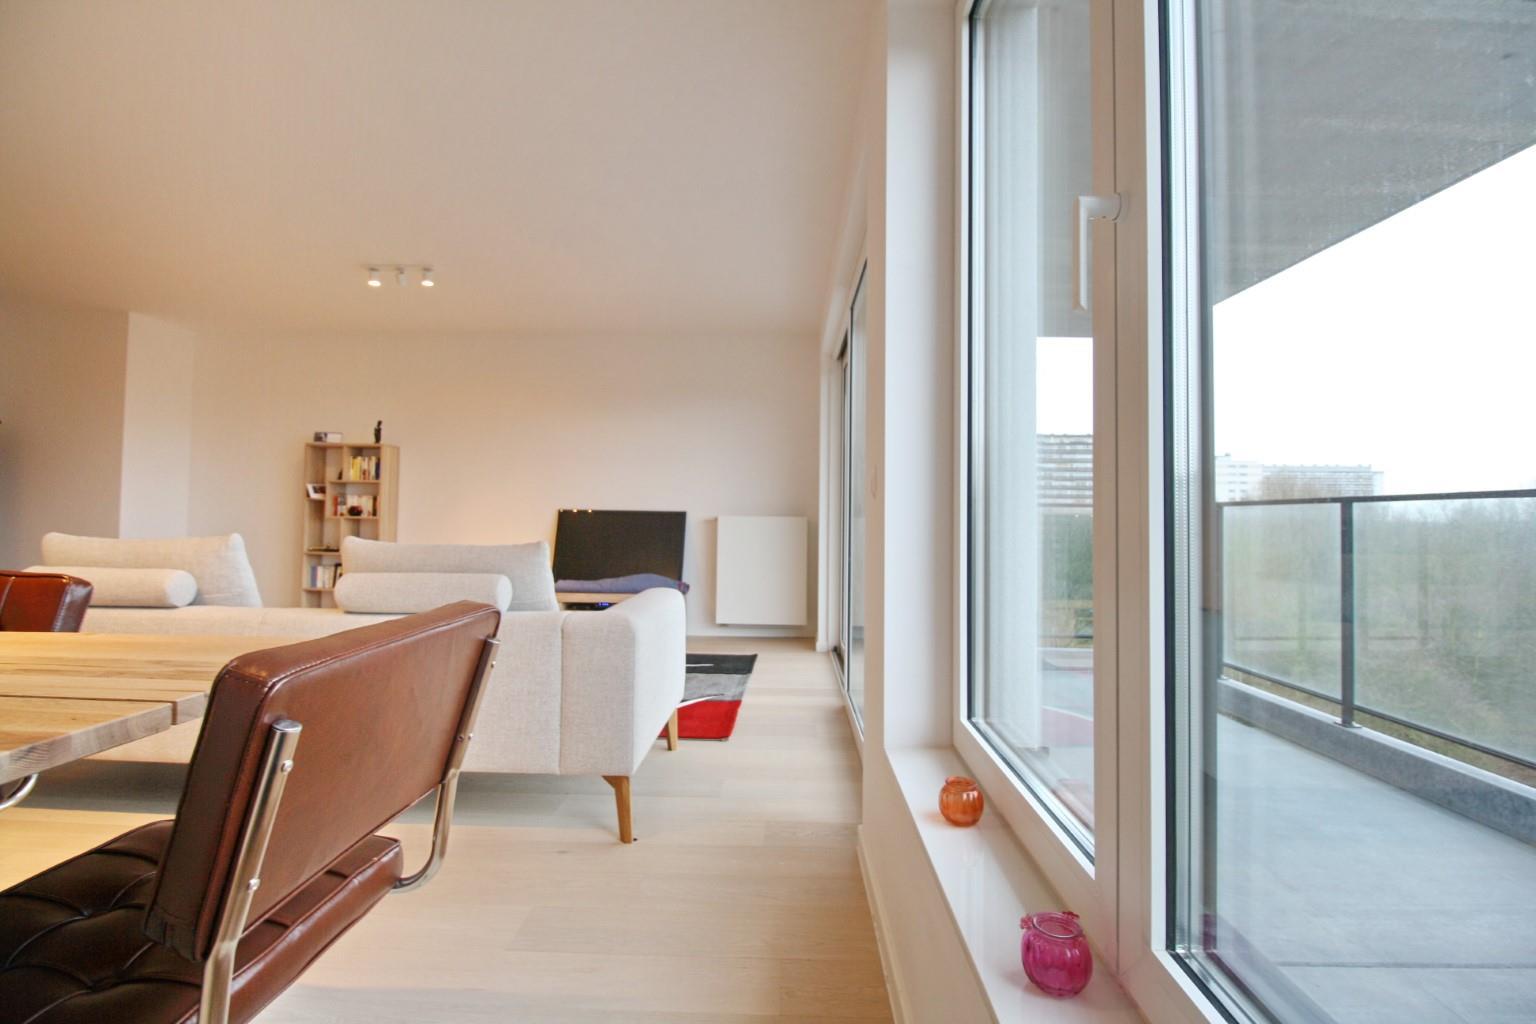 Appartement - Woluwe-Saint-Lambert - #3308144-8